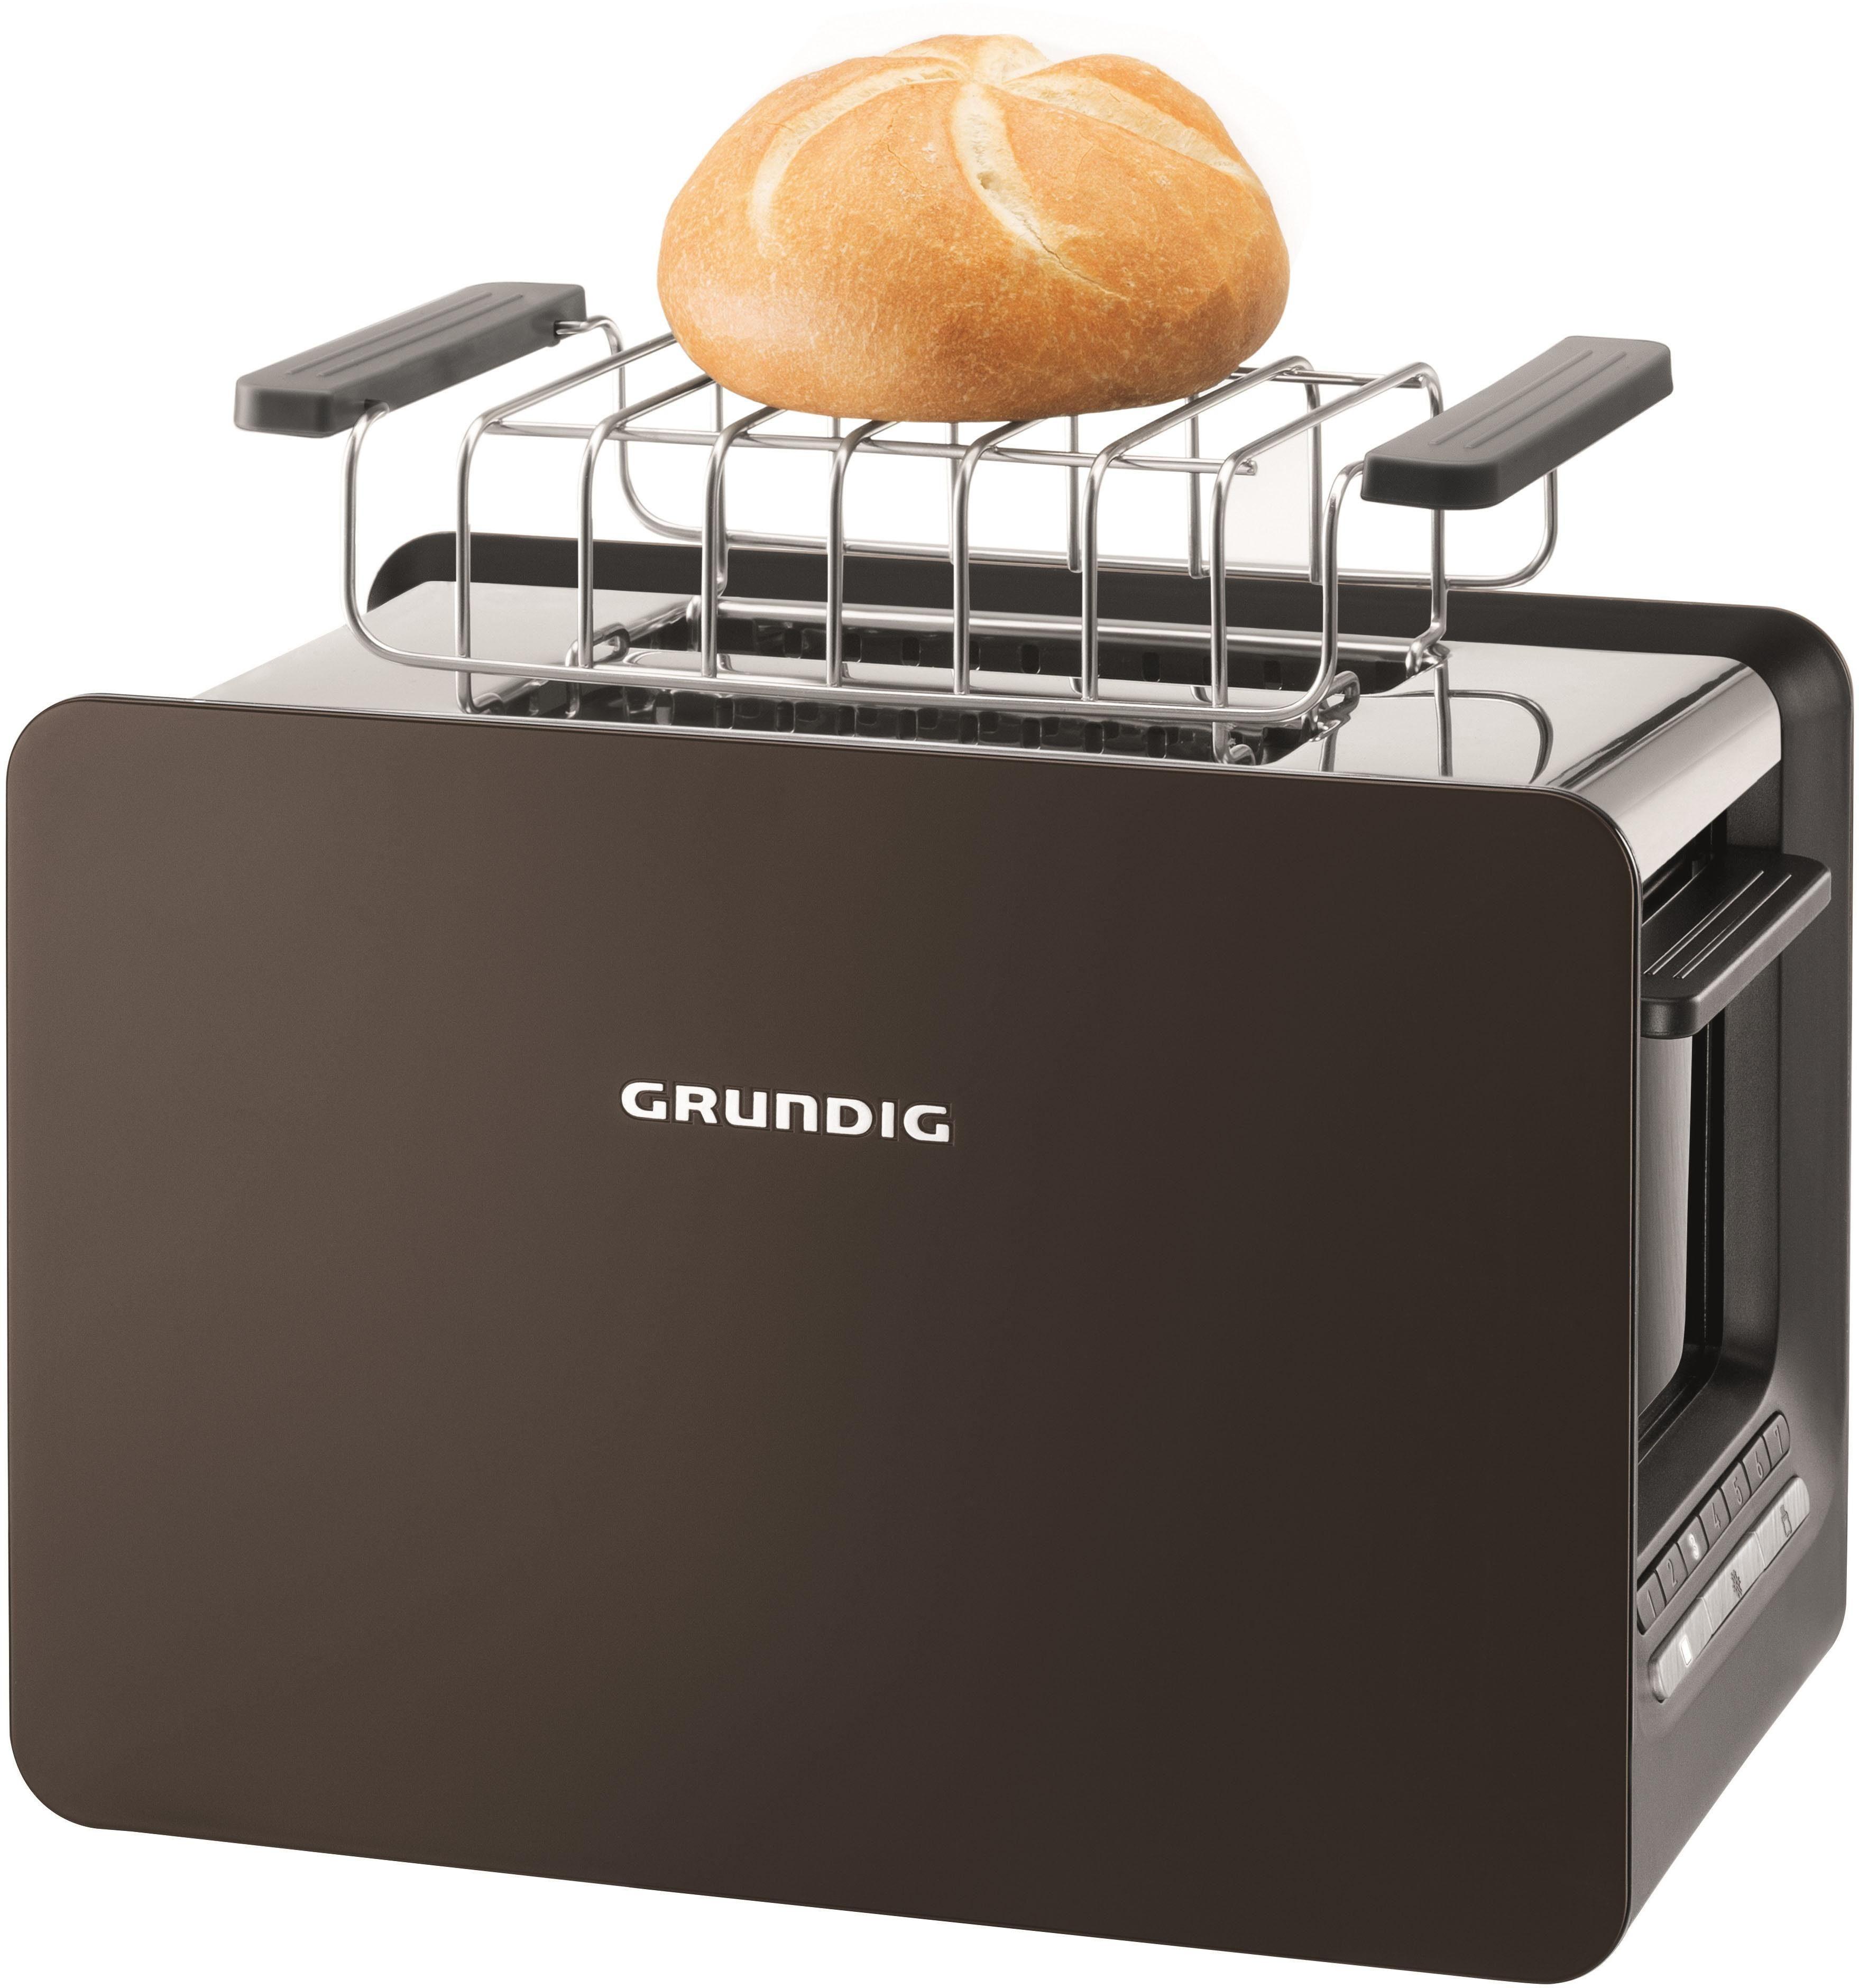 Grundig Toaster TA 7280 G, 870 W